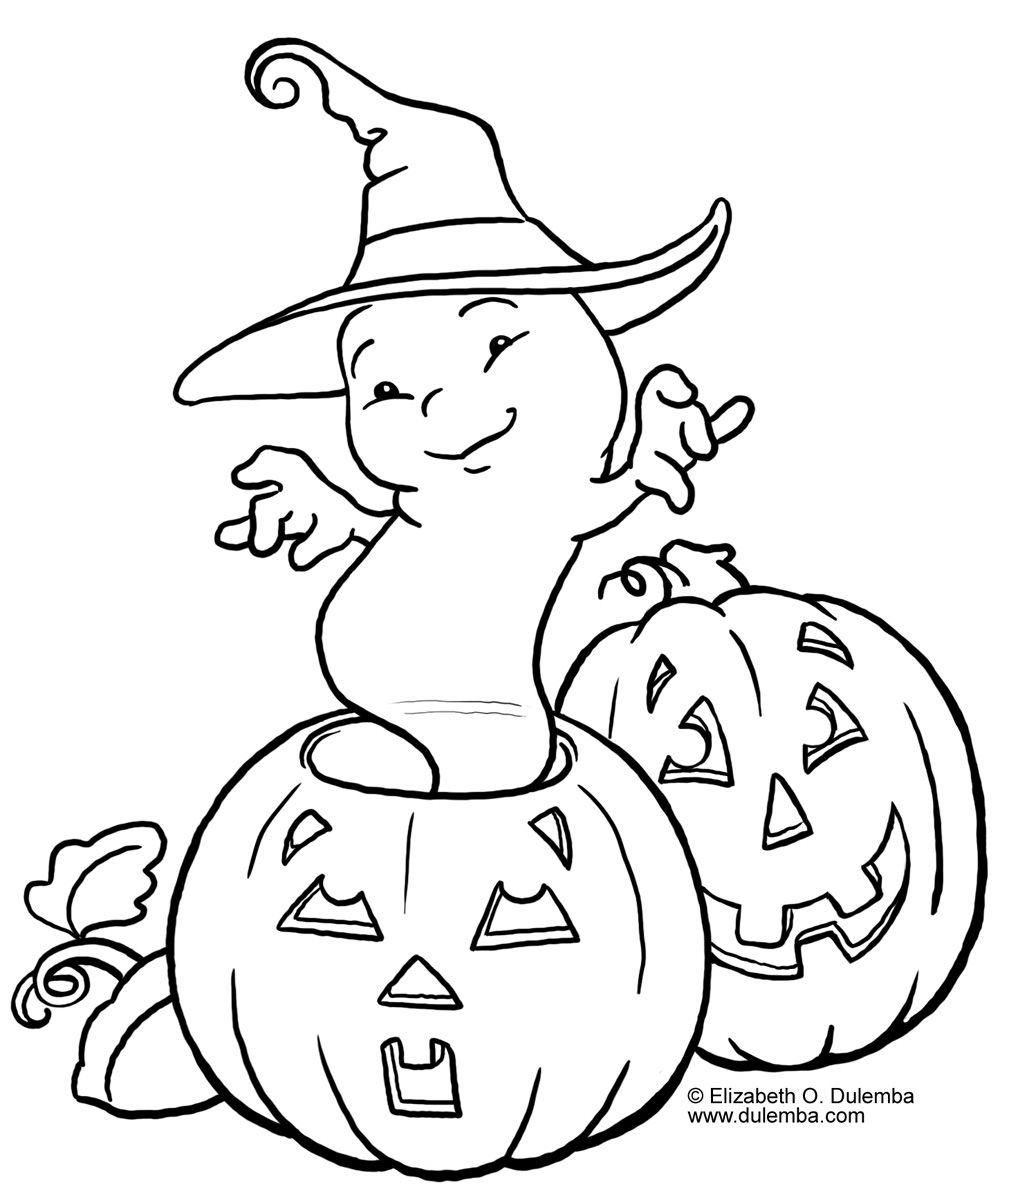 Top 10 Free Printable Halloween Pumpkin Coloring Pages Online